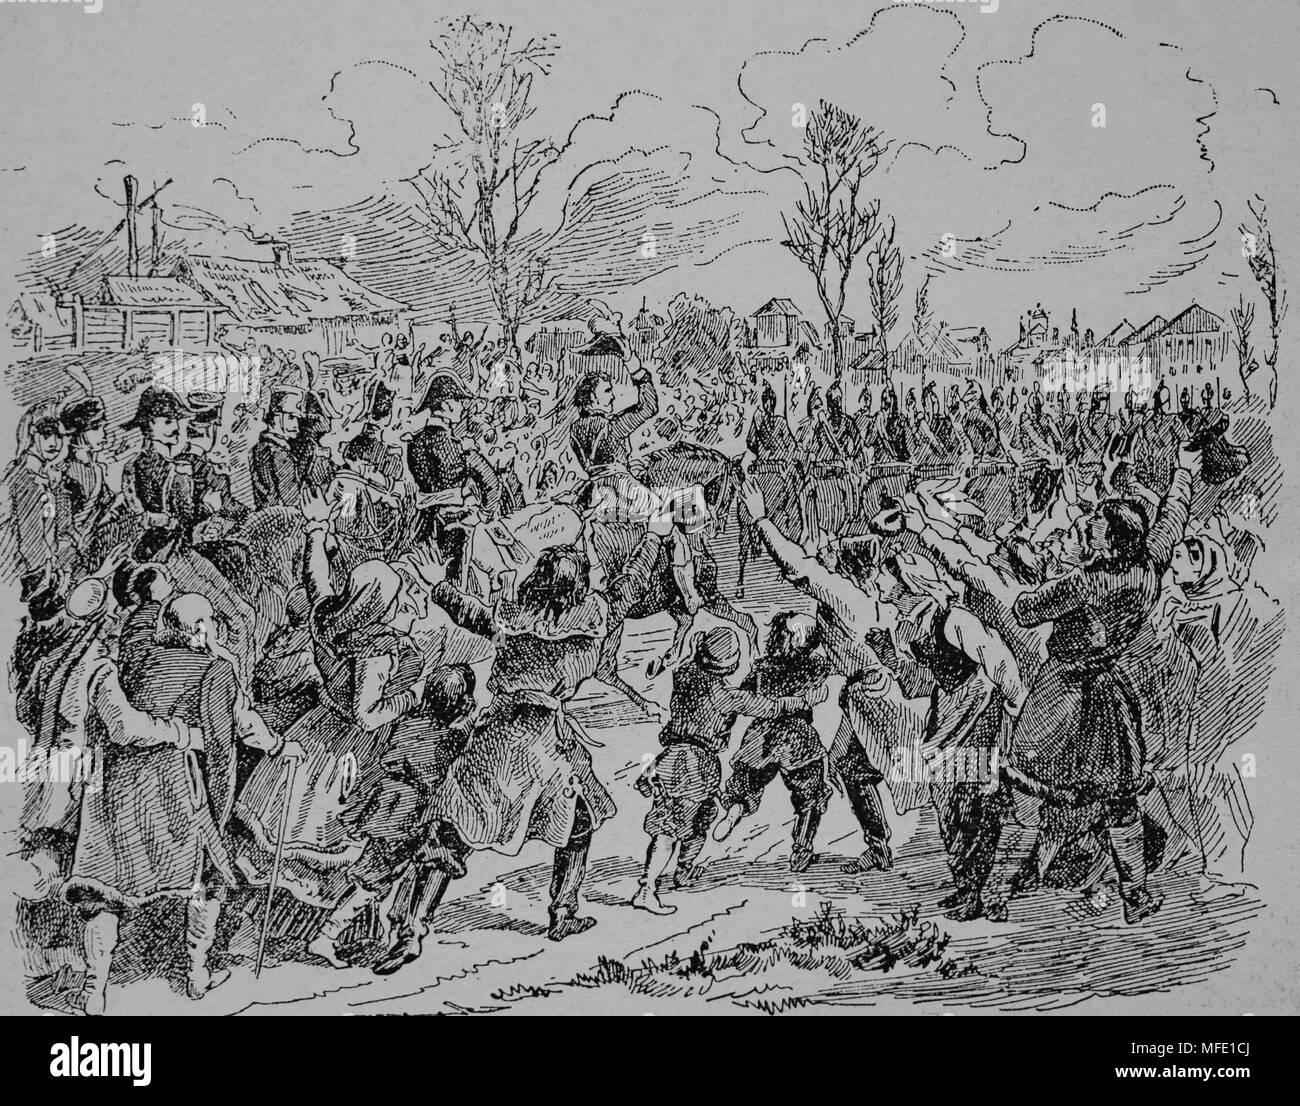 Nov. 1806 Murat enters Warsaw, Poland. The poles receive the French army of Napoleon as their liberator. Engraving, 19thc - Stock Image